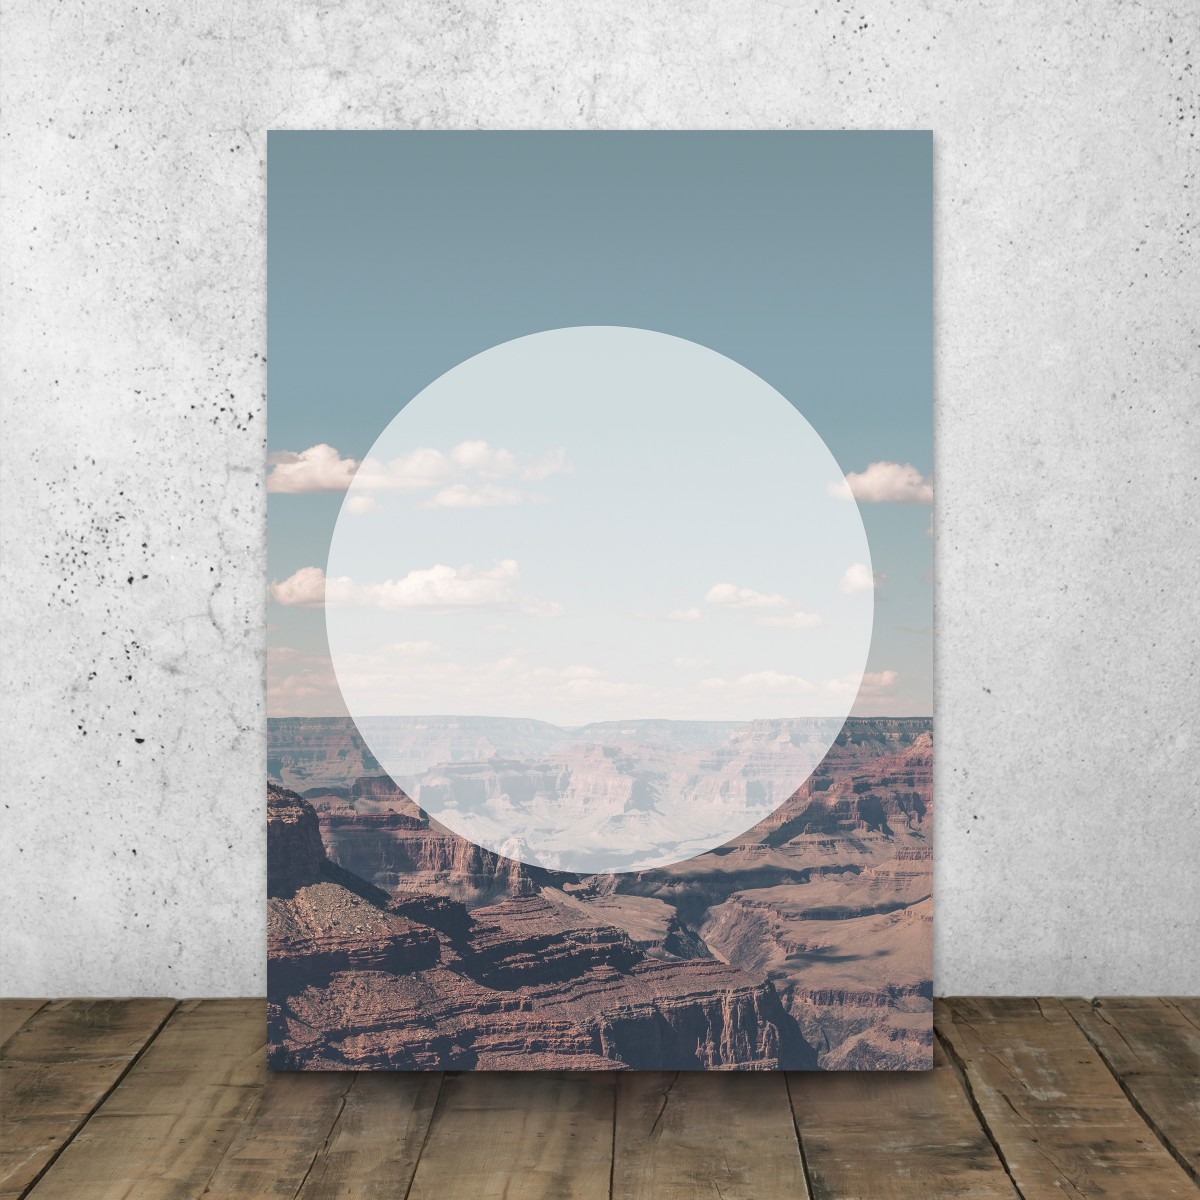 JOE MANIA / Modern Artprint Poster / Circular Landscapes (Grand Canyon)